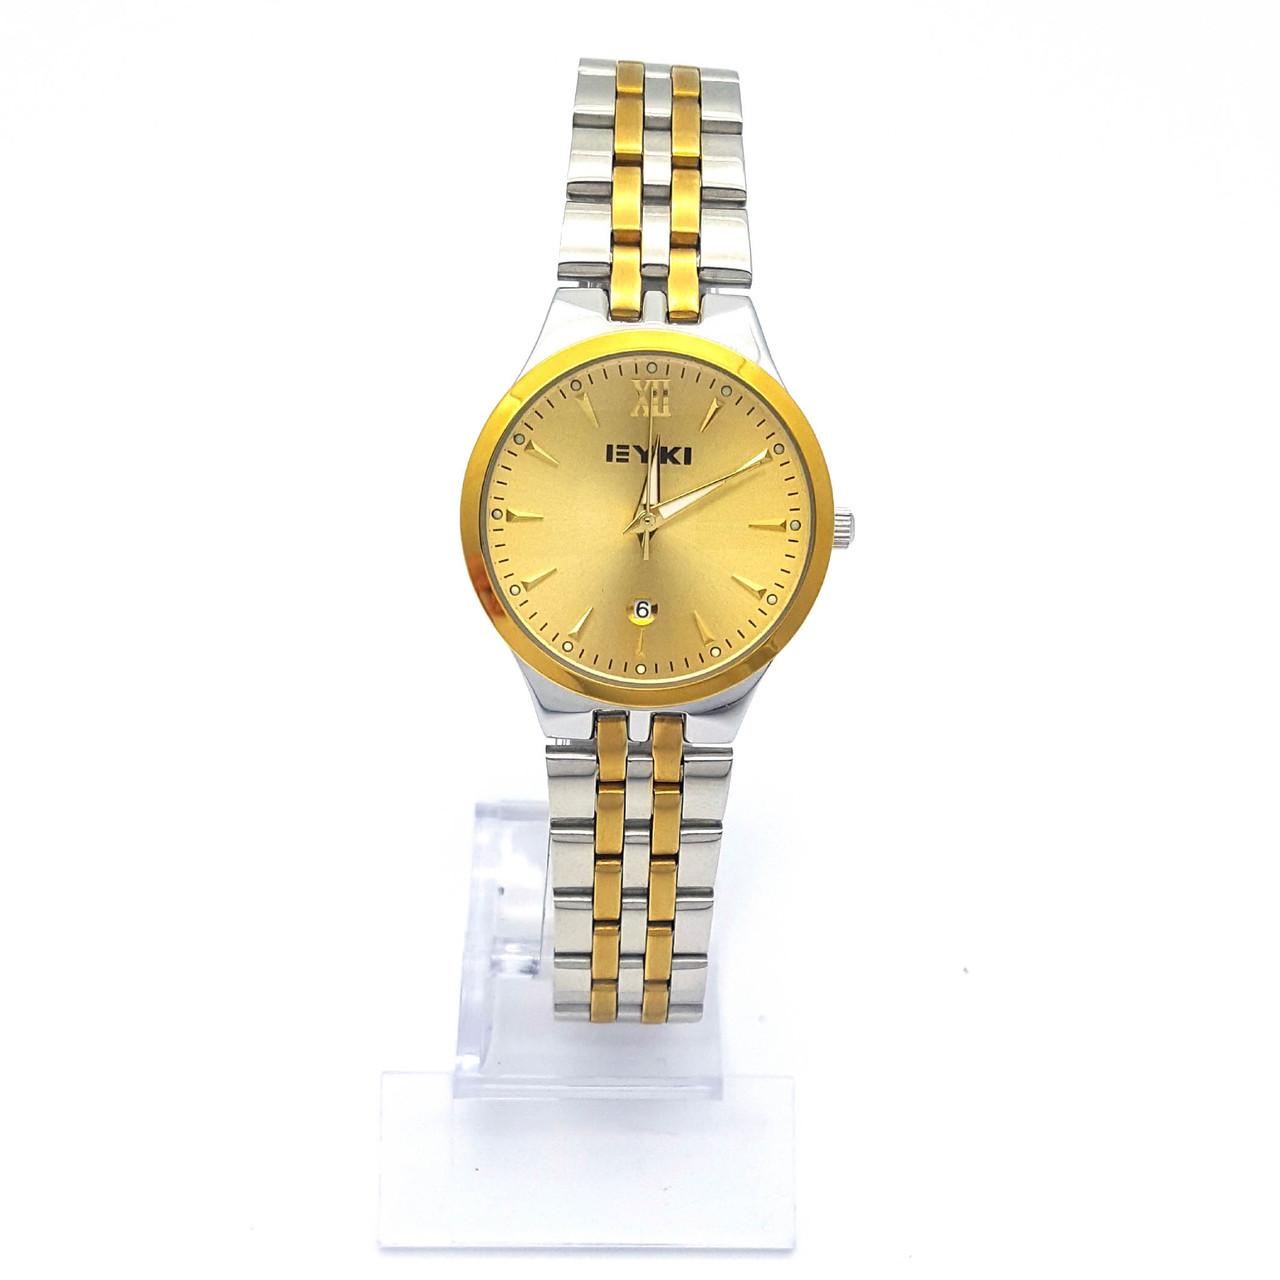 Часы EYKI под Серебро с золотистыми вставками, на браслете, р.20, циферблат 30мм